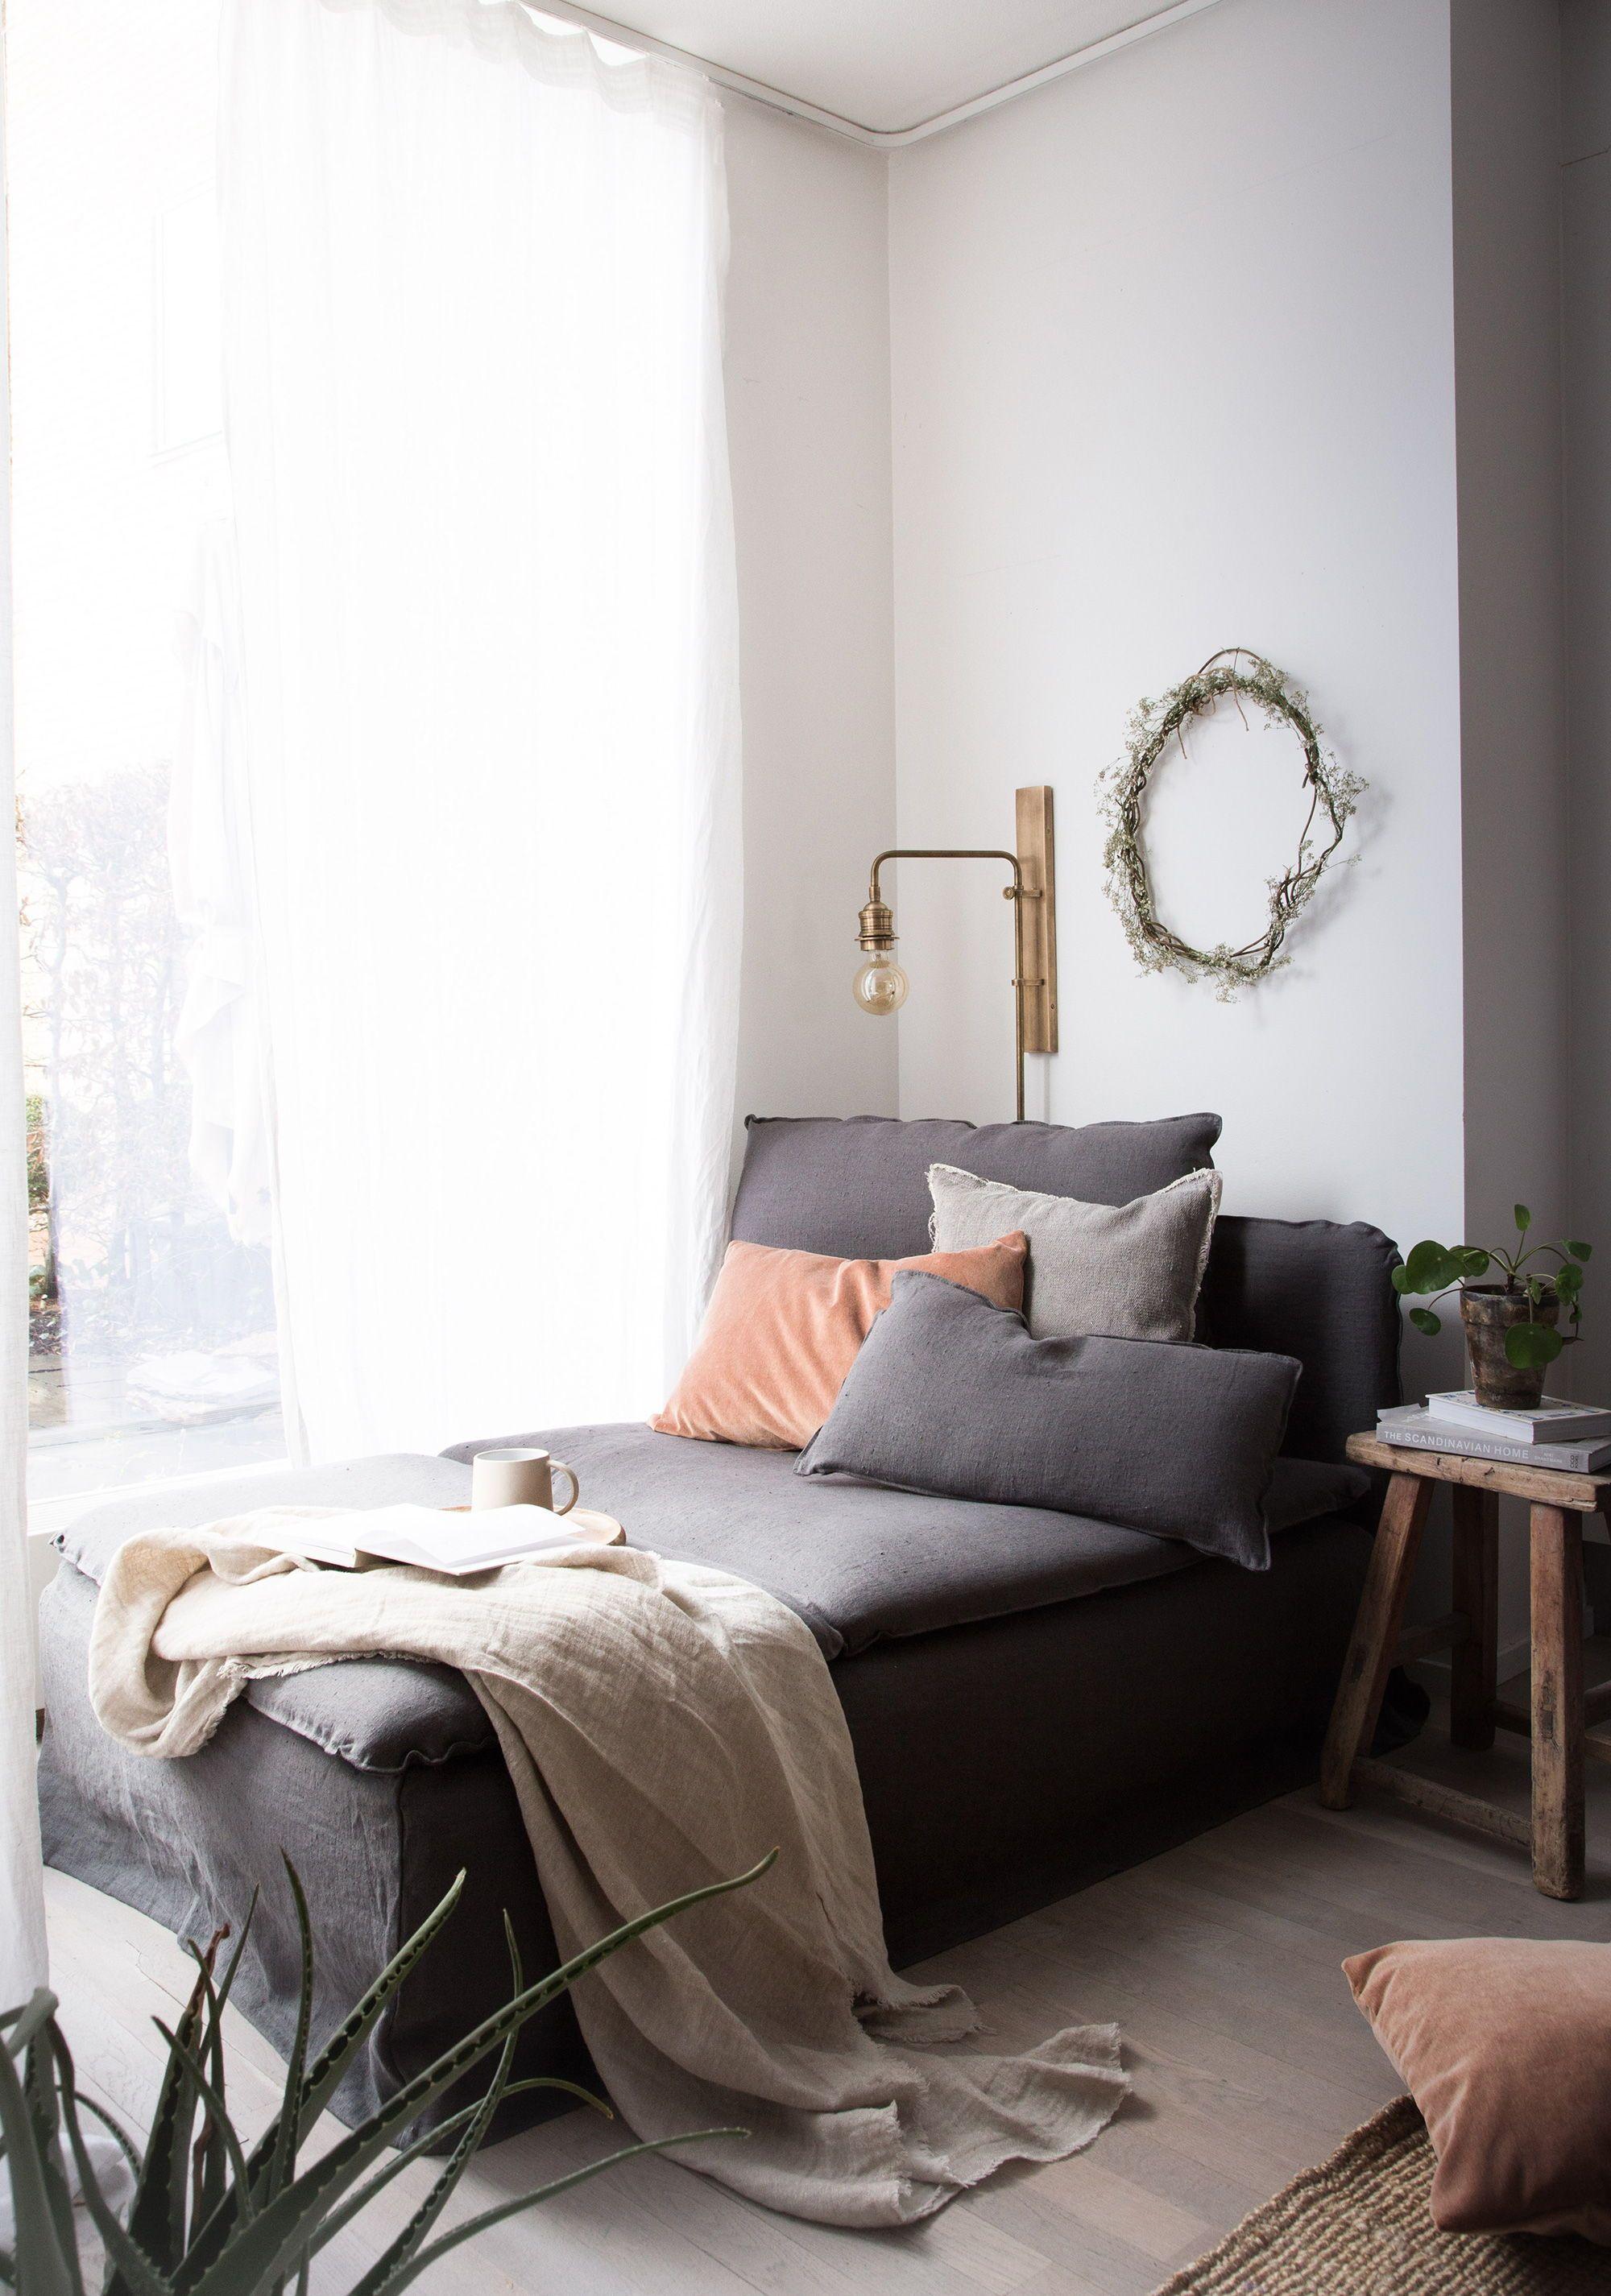 Cozy minimalist corner grey linen sofa velvet cushion covers moody pastel shades natural light light wooden floors ikea söderhamn chaise